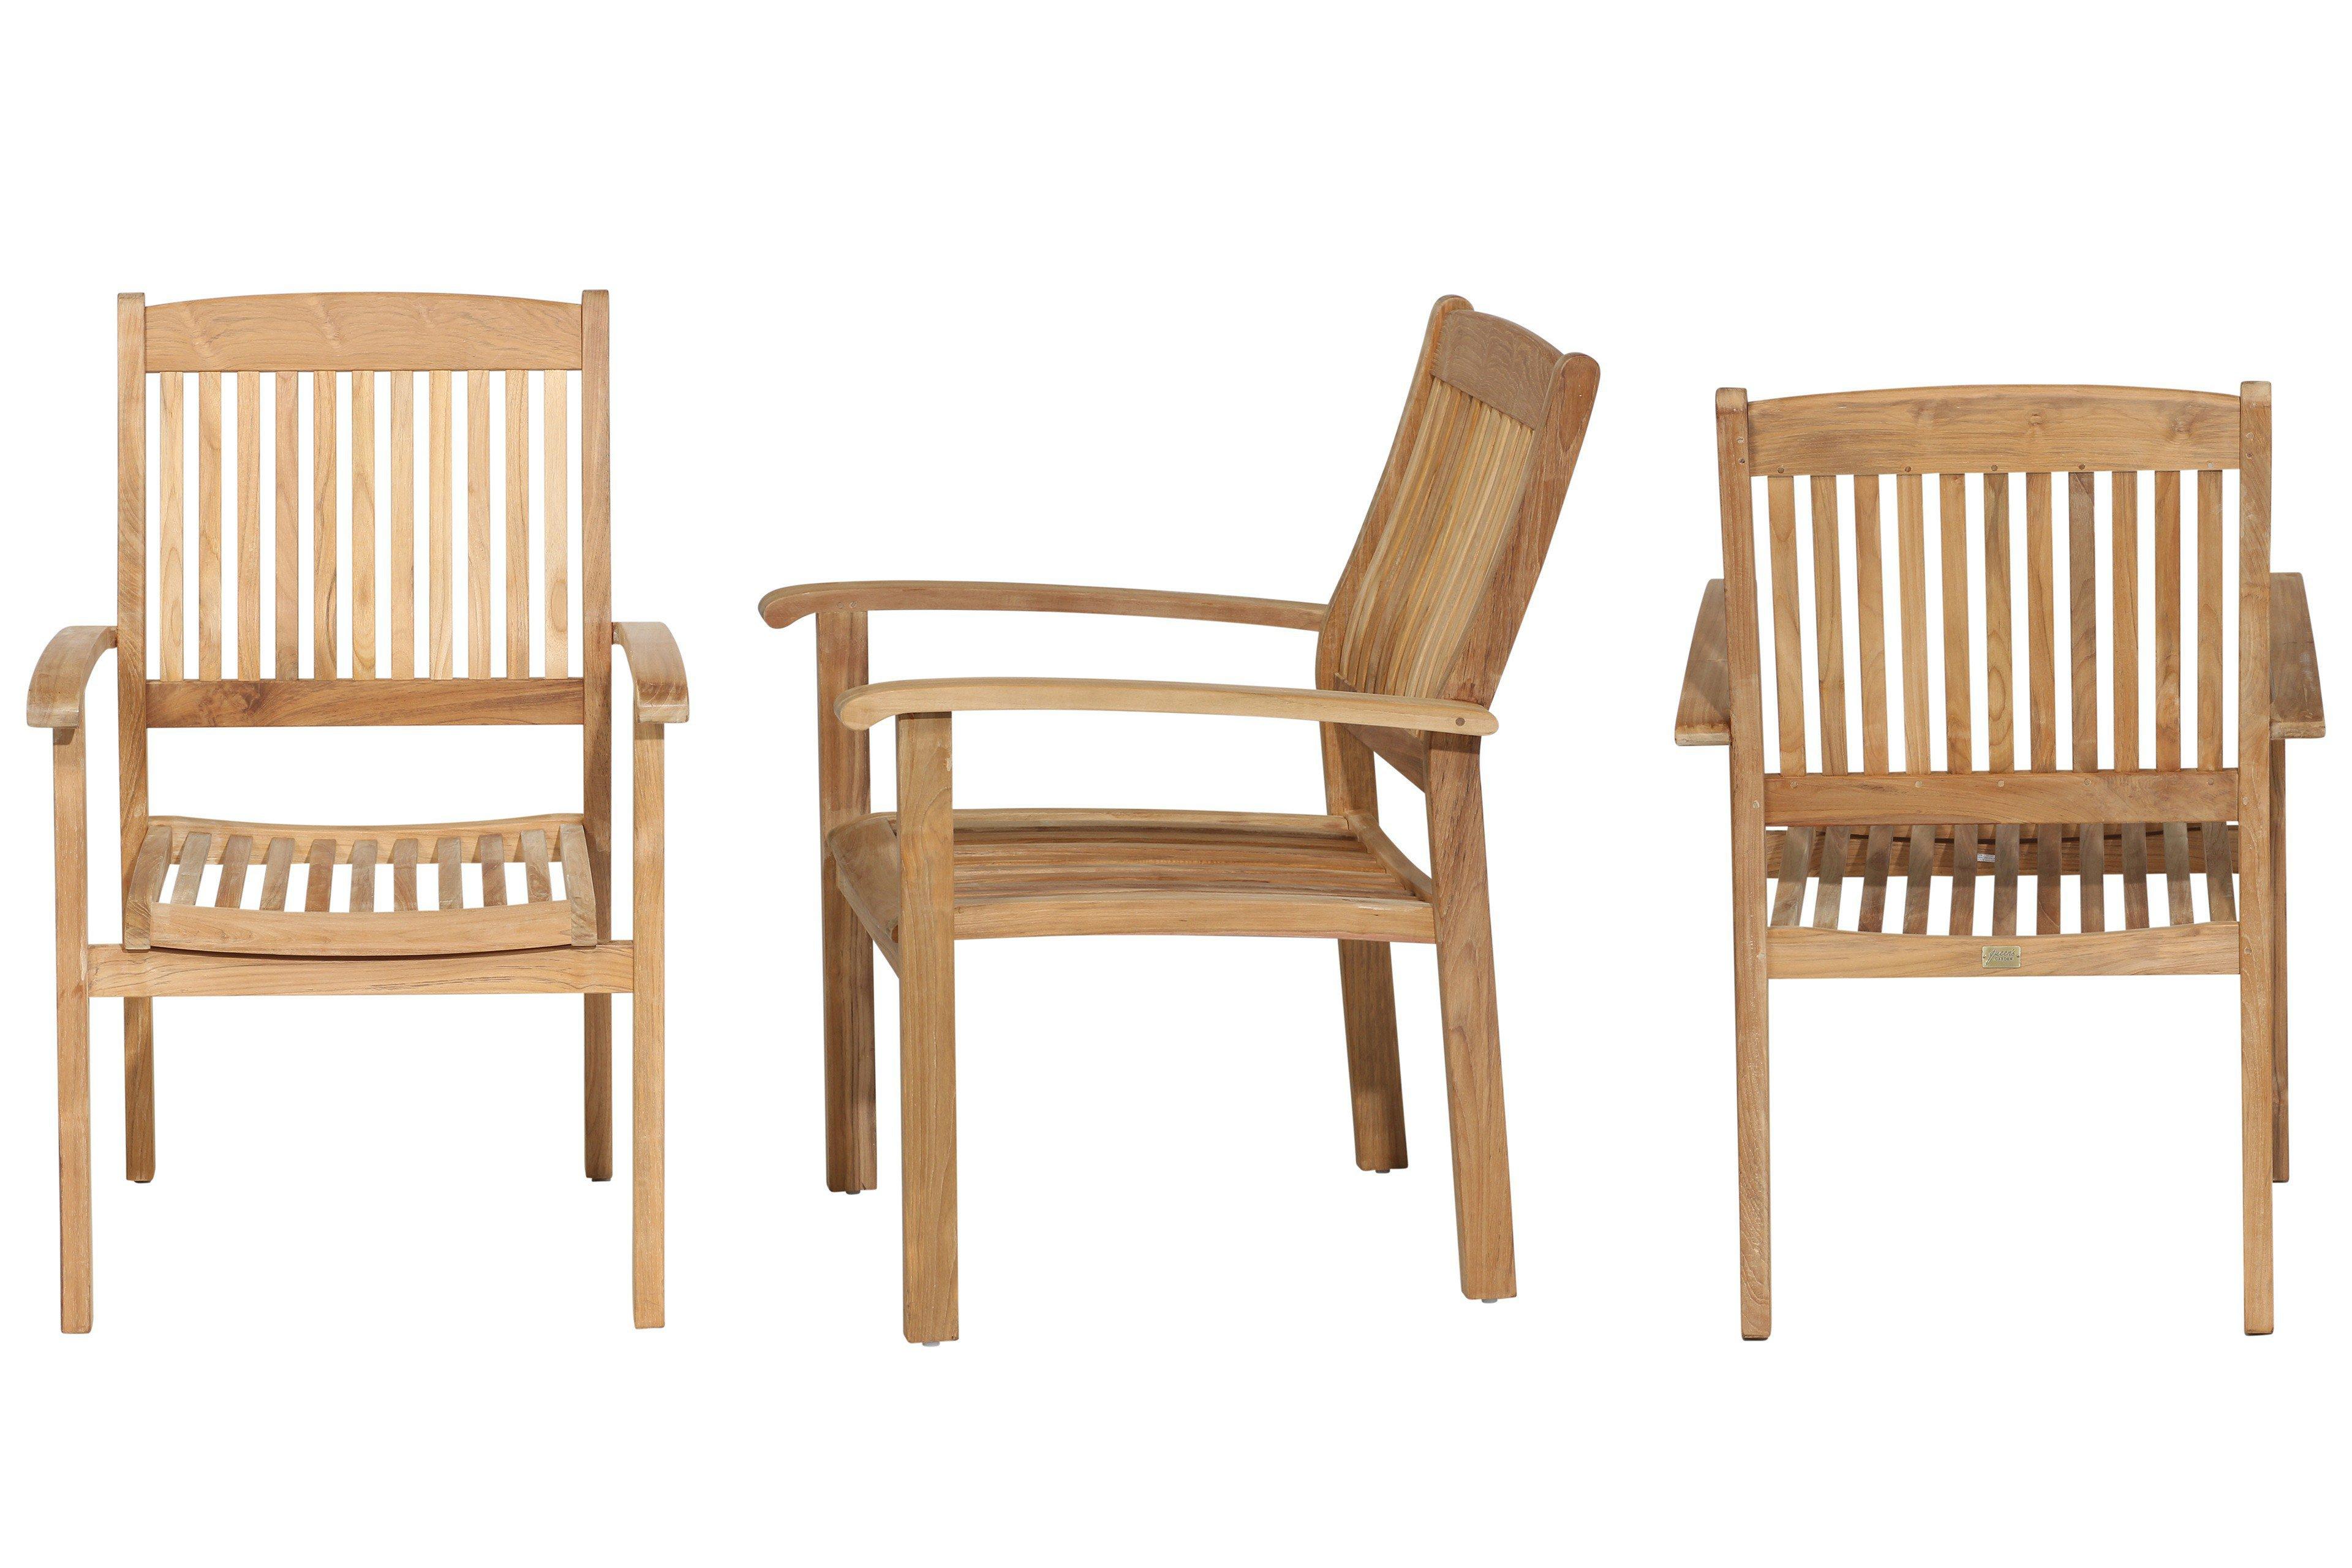 gartenm bel set queen 39 s garden york m bel letz ihr online shop. Black Bedroom Furniture Sets. Home Design Ideas